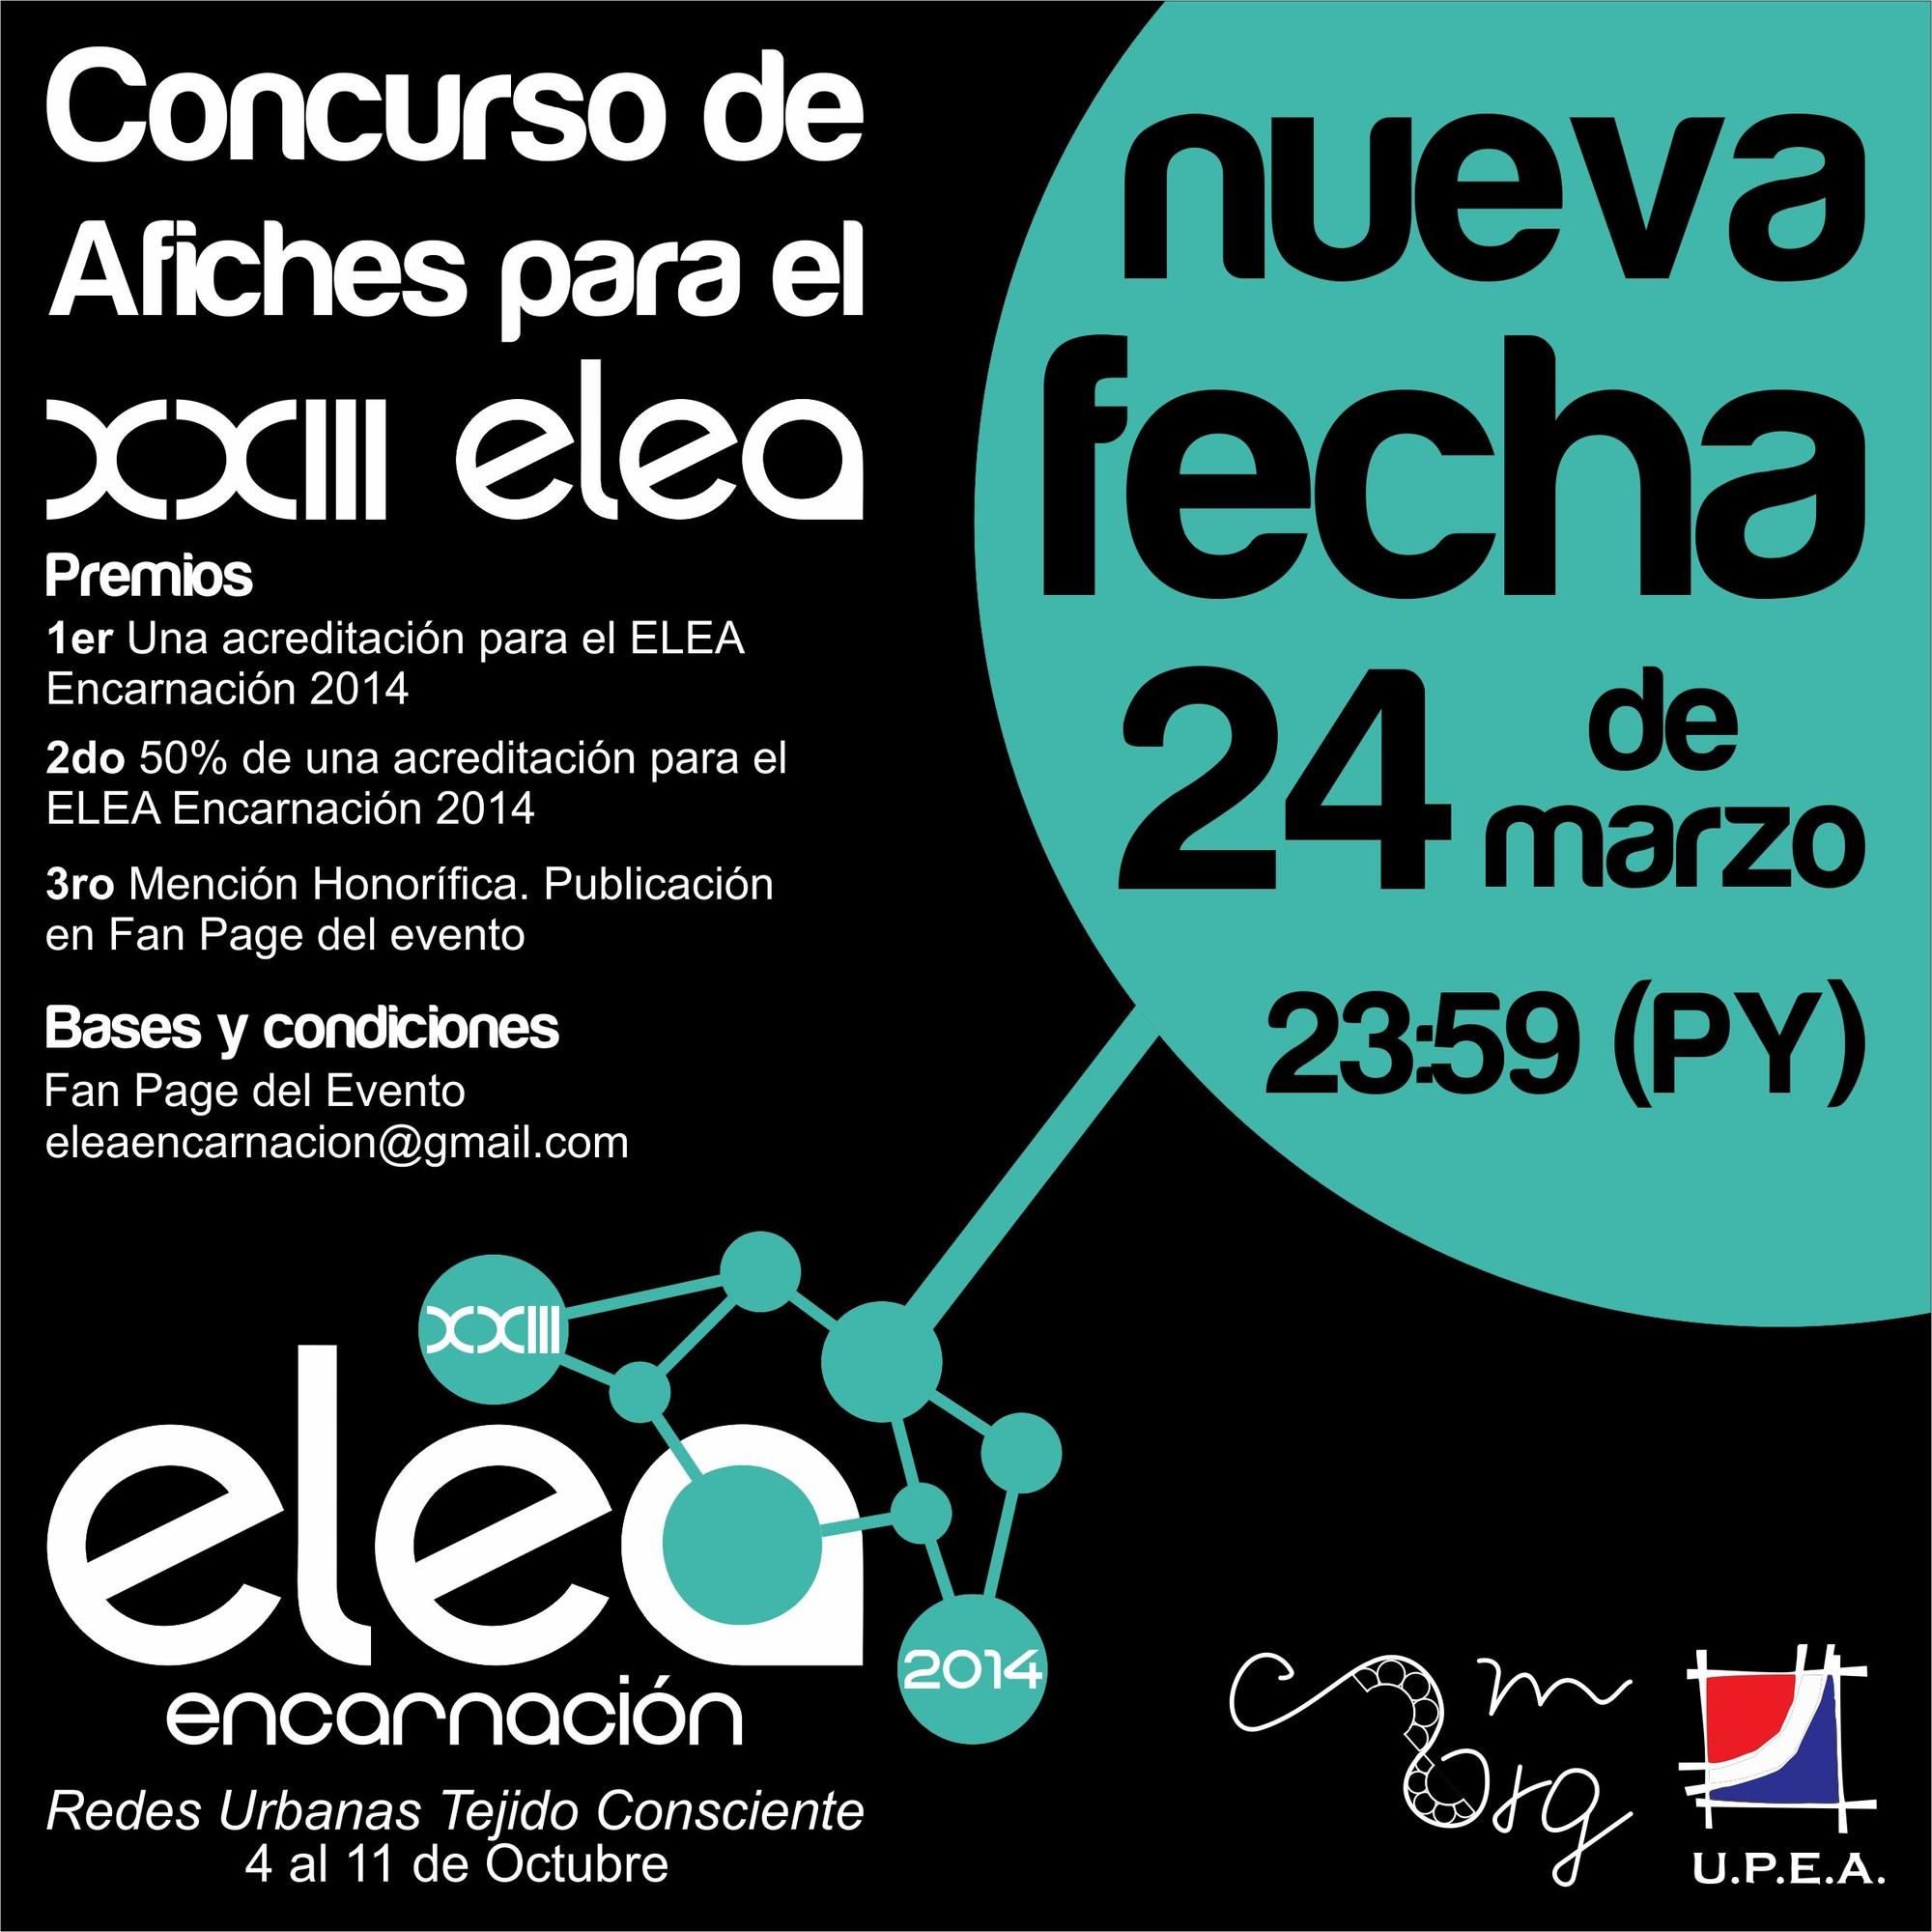 Convocatoria Concurso Creación Afiche XXIII ELEA Encarnación 2014 / Paraguay, Afiche. Image Courtesy of XXIII ELEA Encarnación 2014